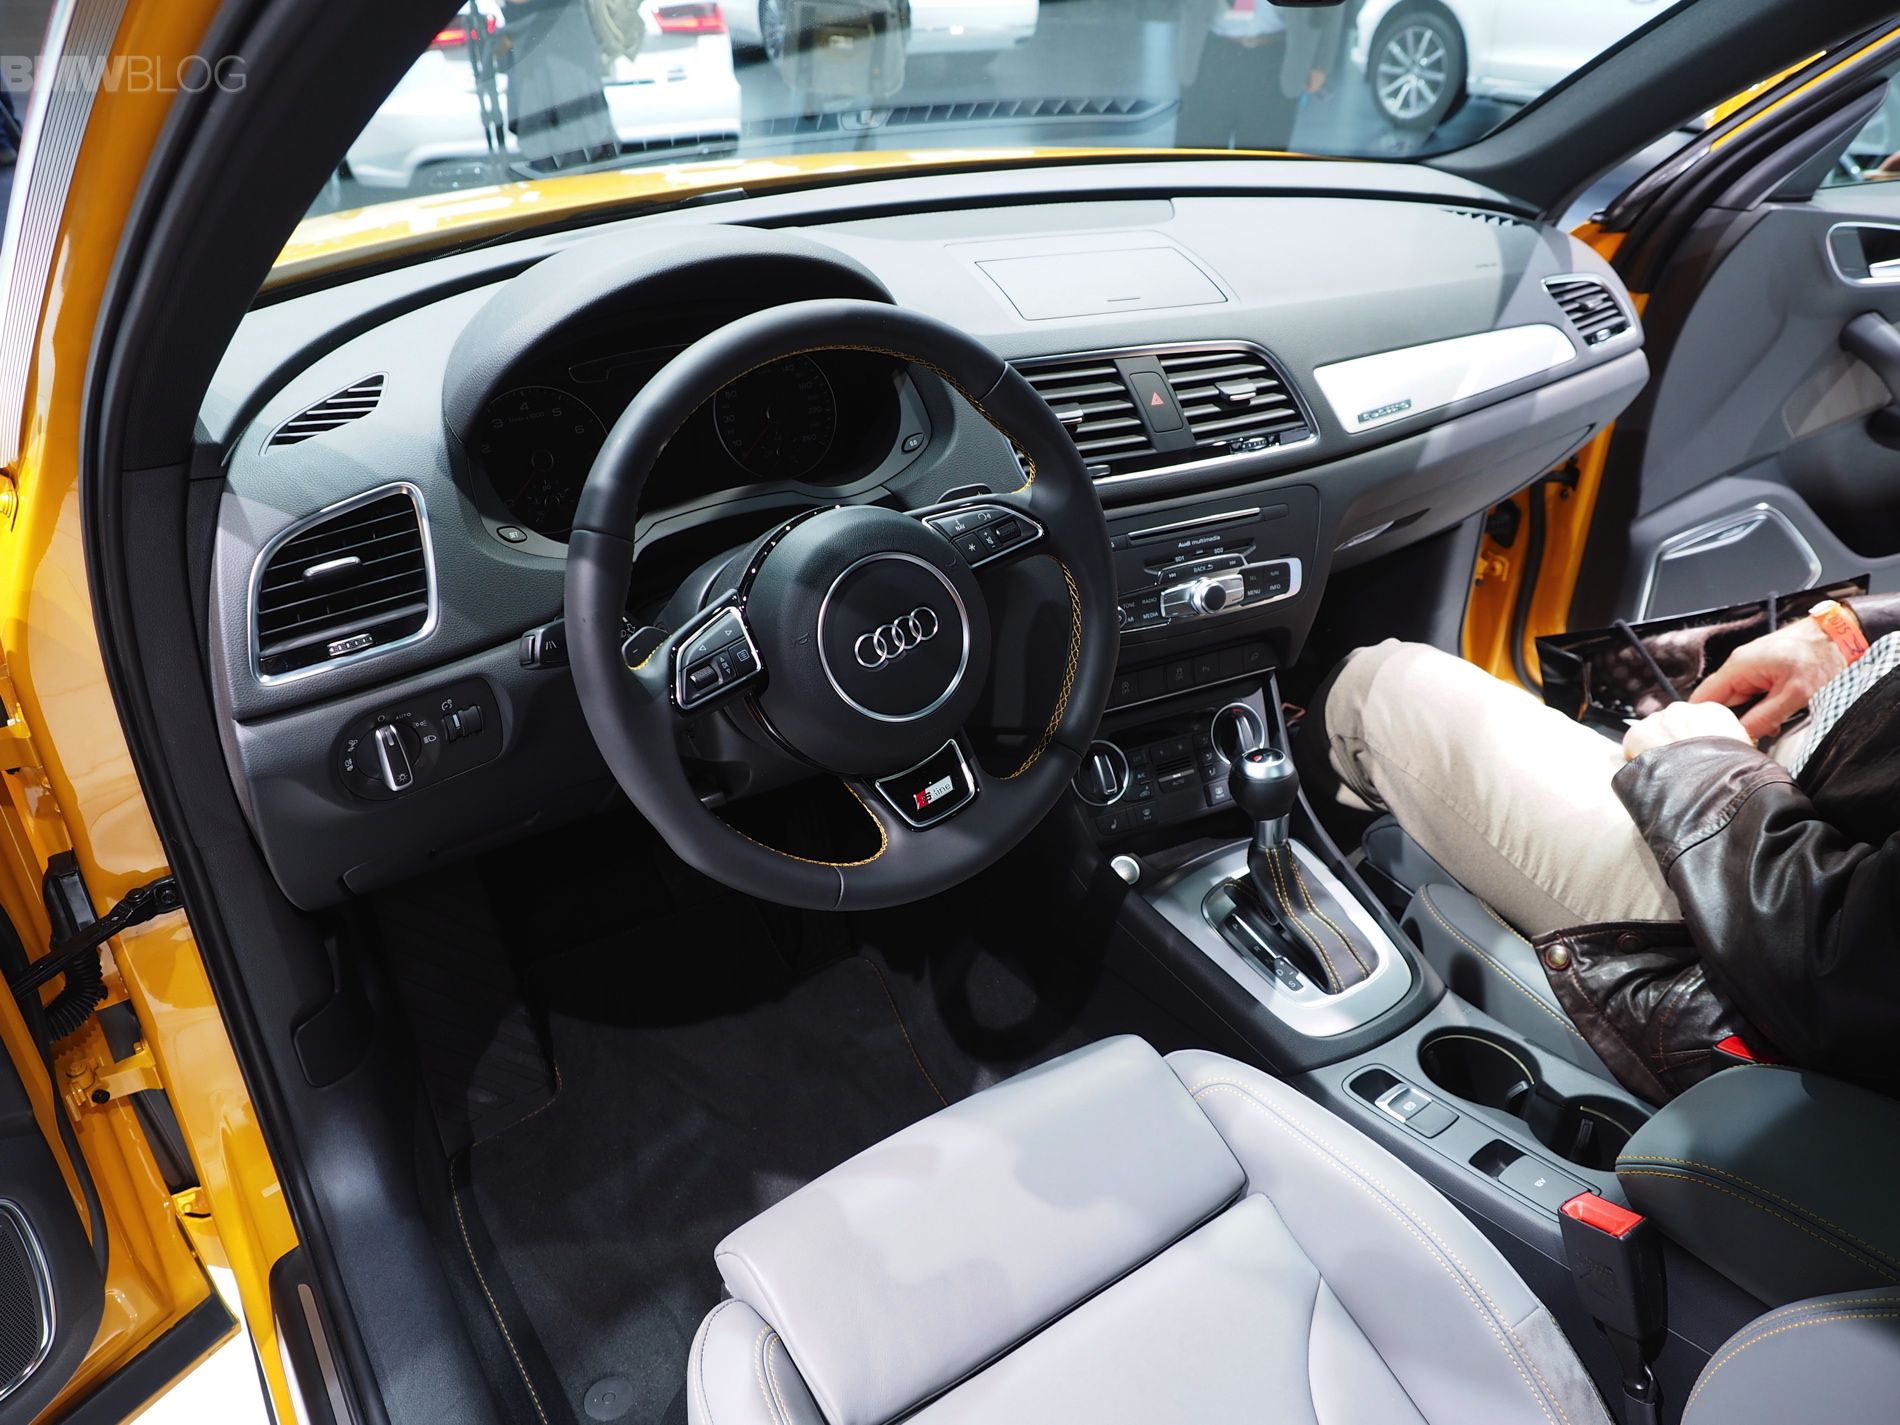 2017 Audi Q3 Images 13 750x563